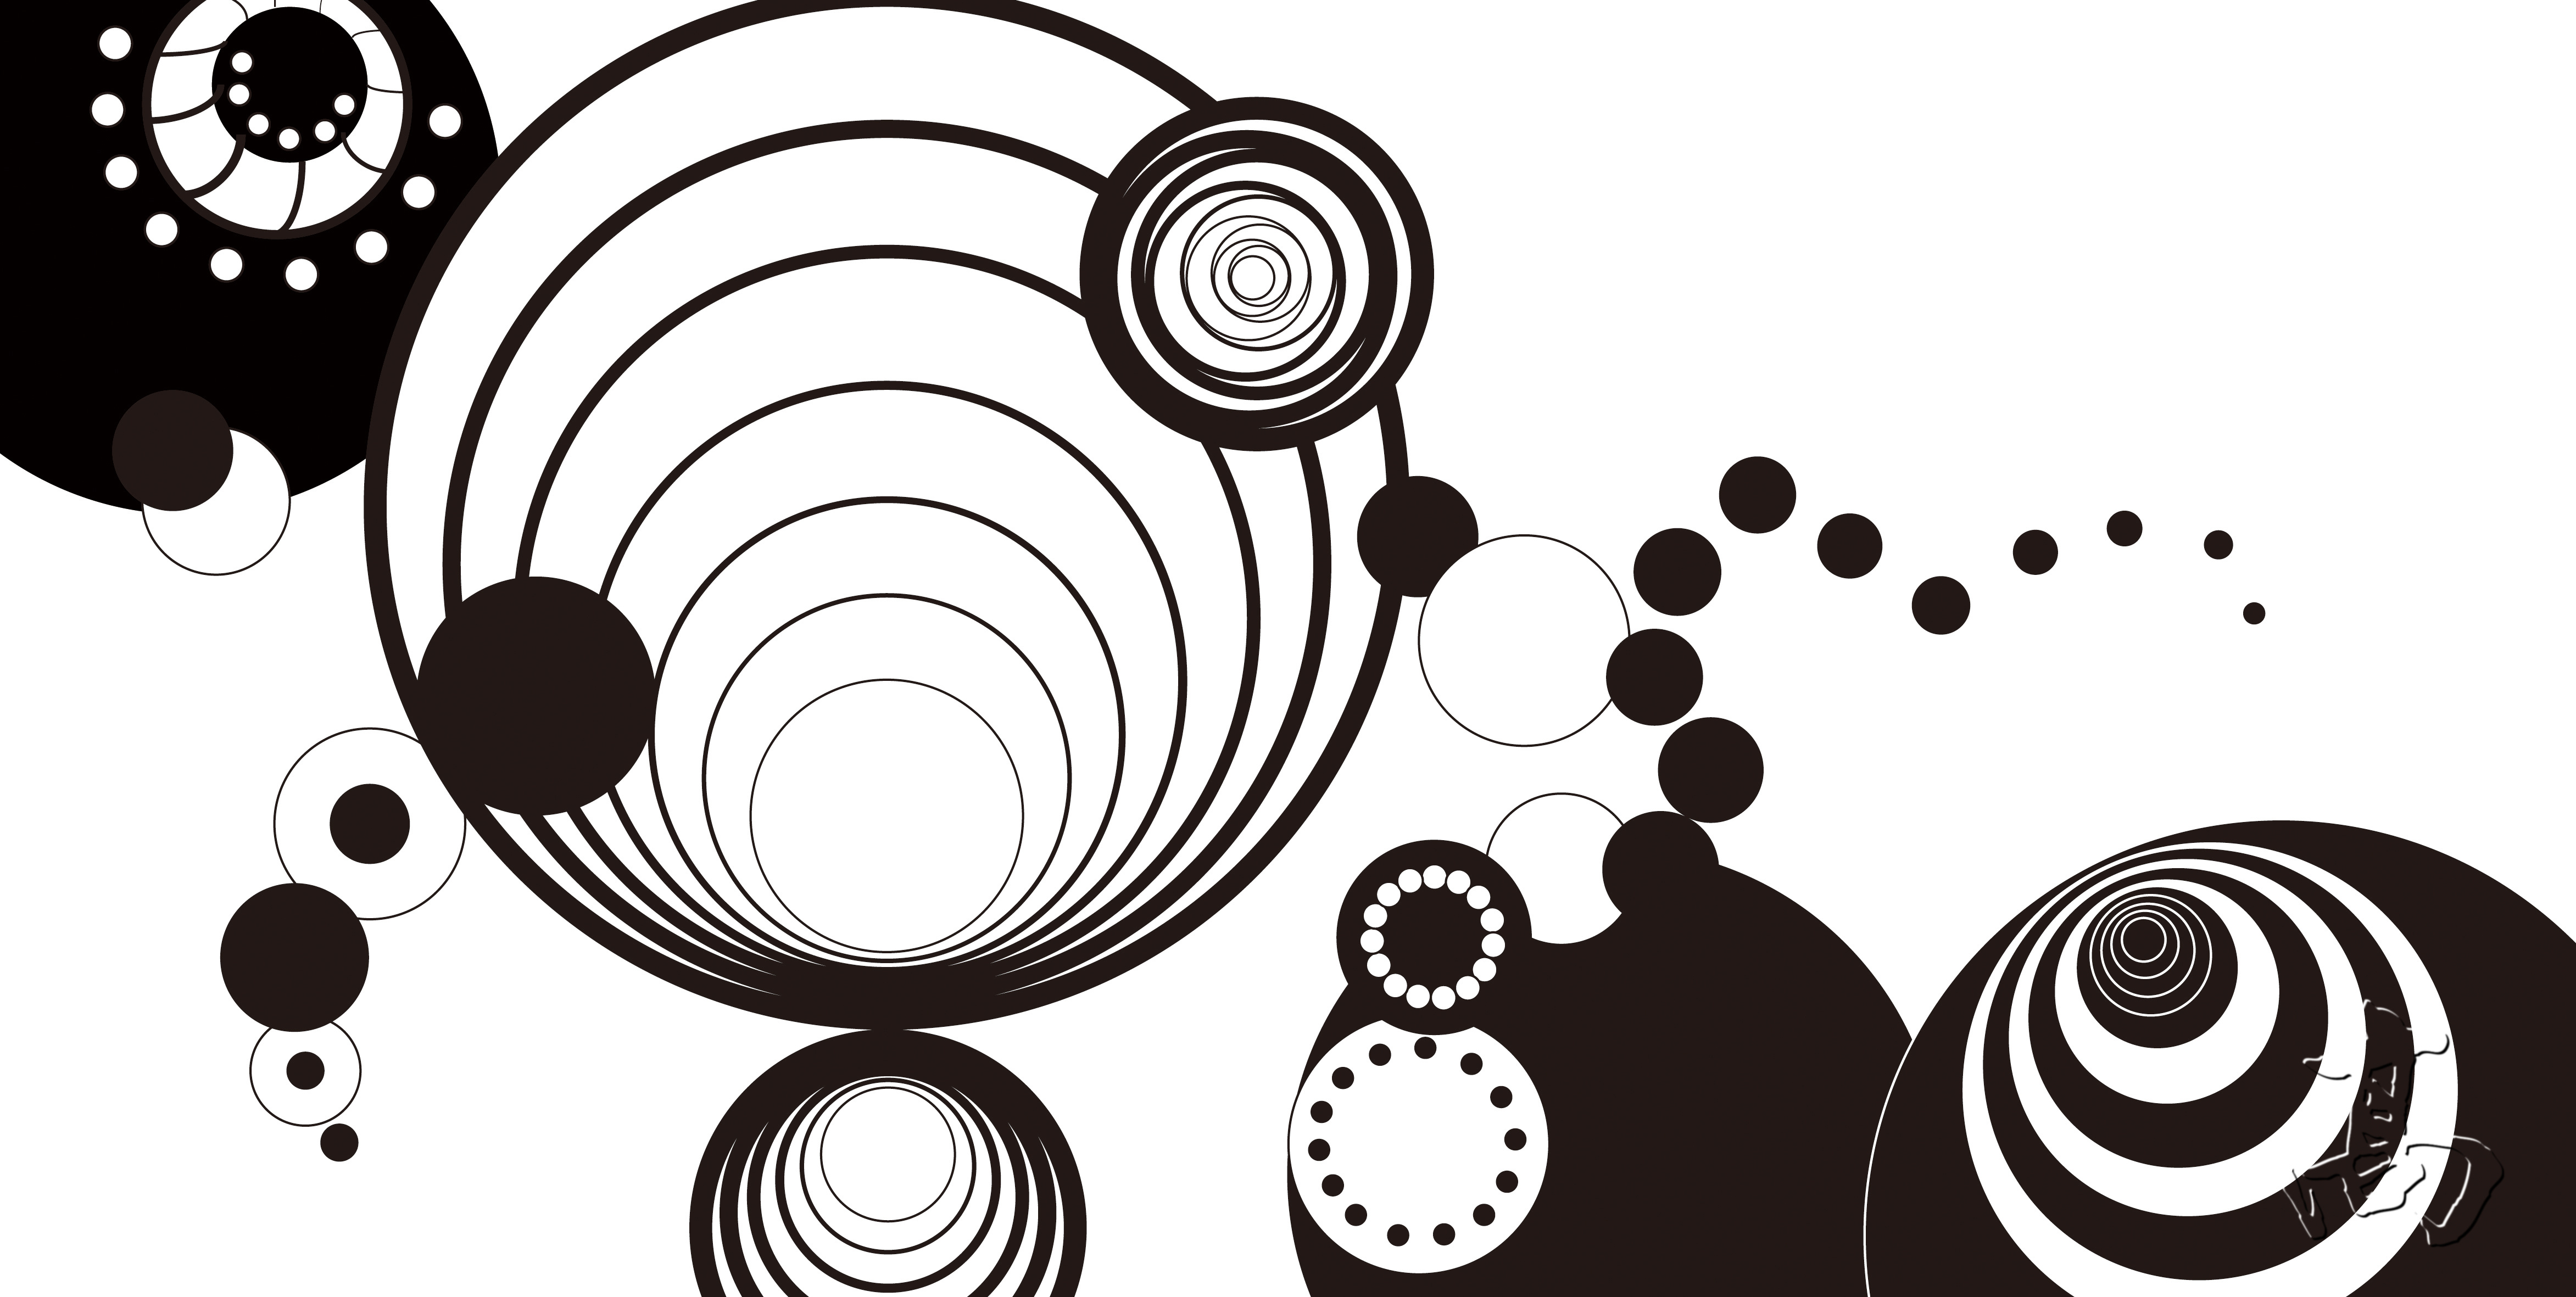 xiangaochao_自己做的小插图|平面|品牌|gaochao23 - 原创作品